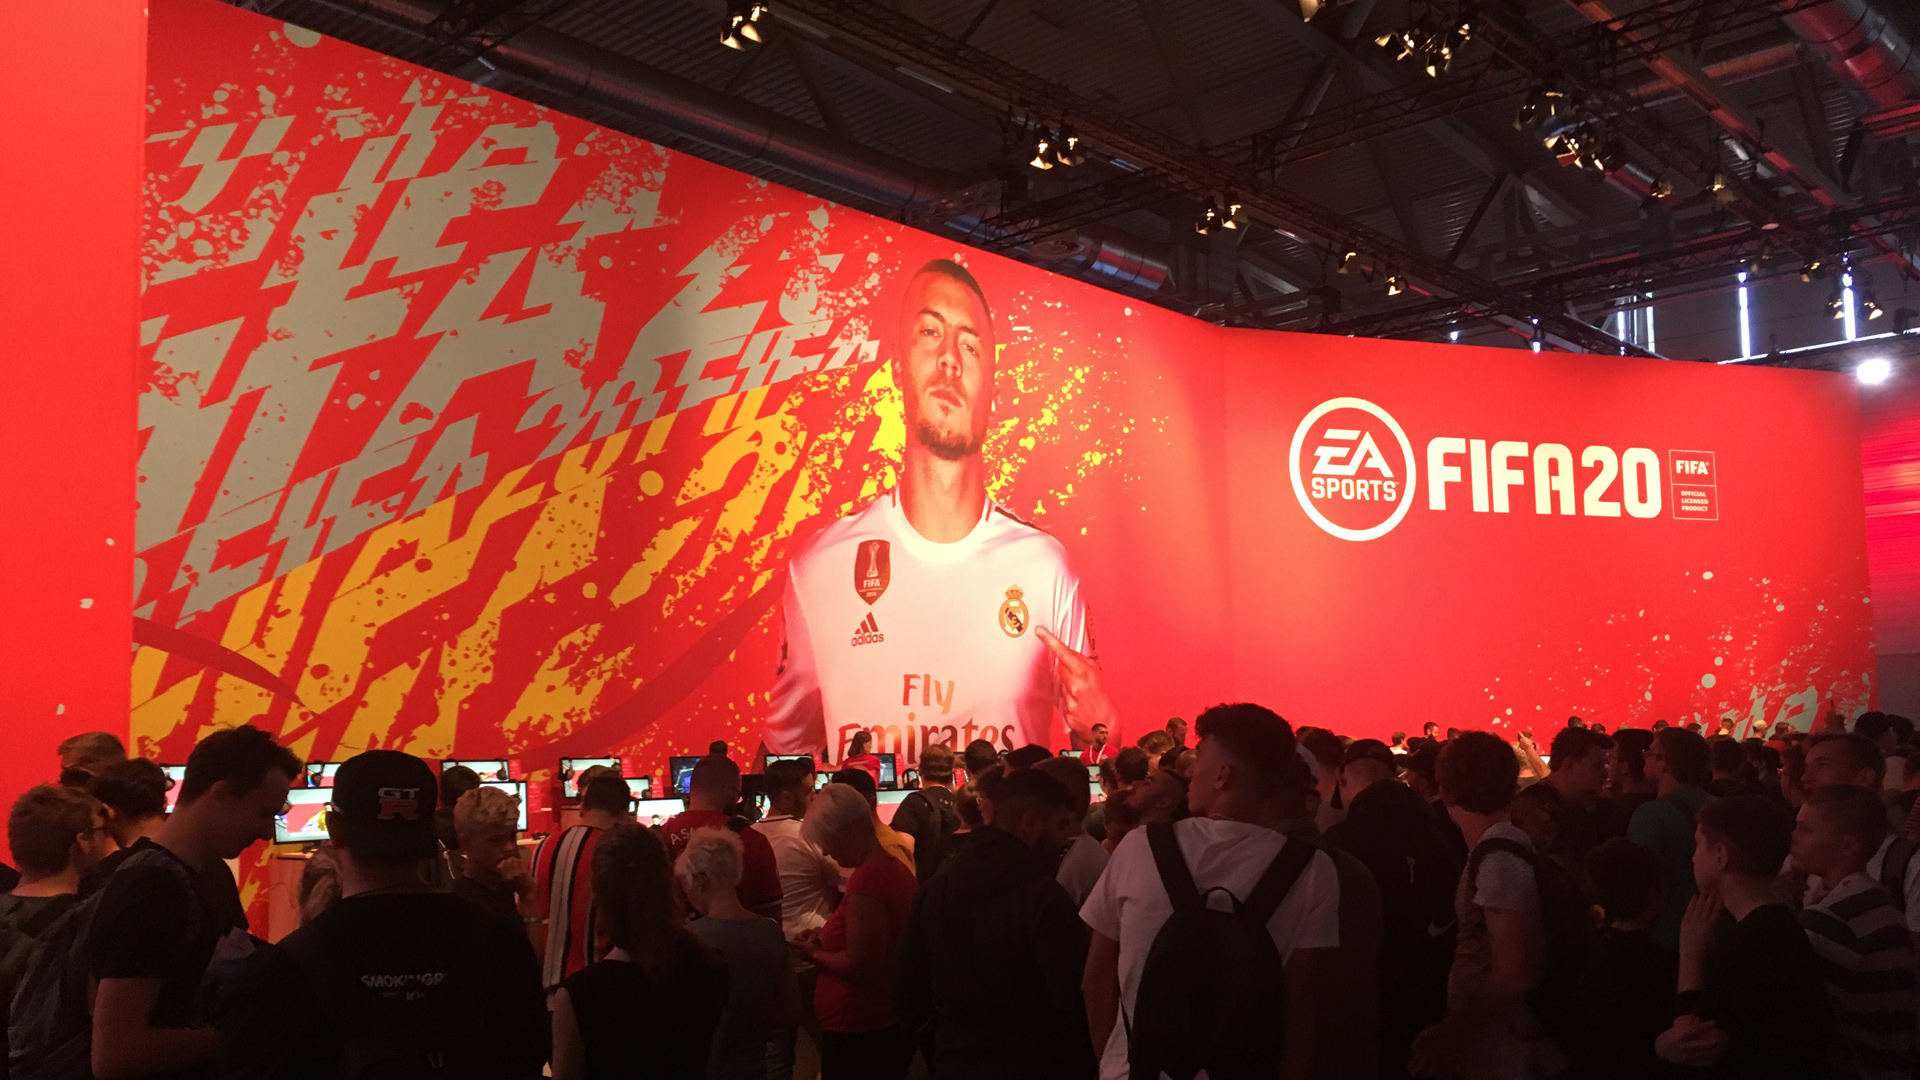 gamescom 2019 FIFA 20 stage